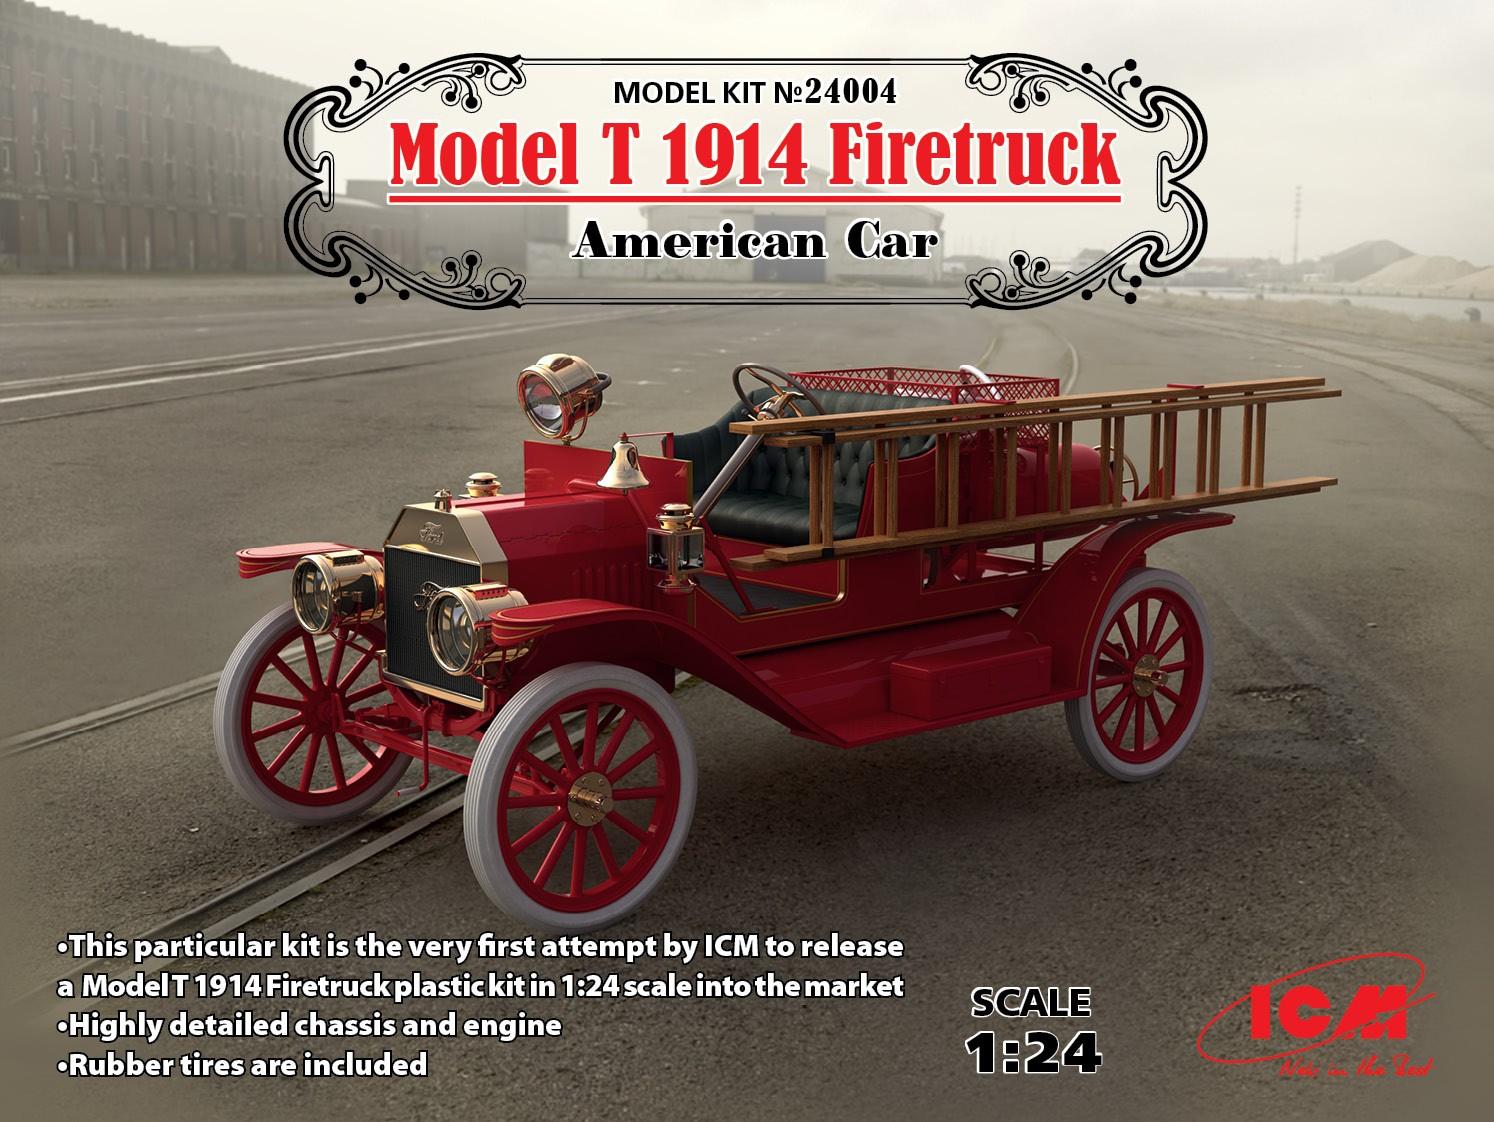 ICM 1/24 Model T 1914 Firetruck, American Car